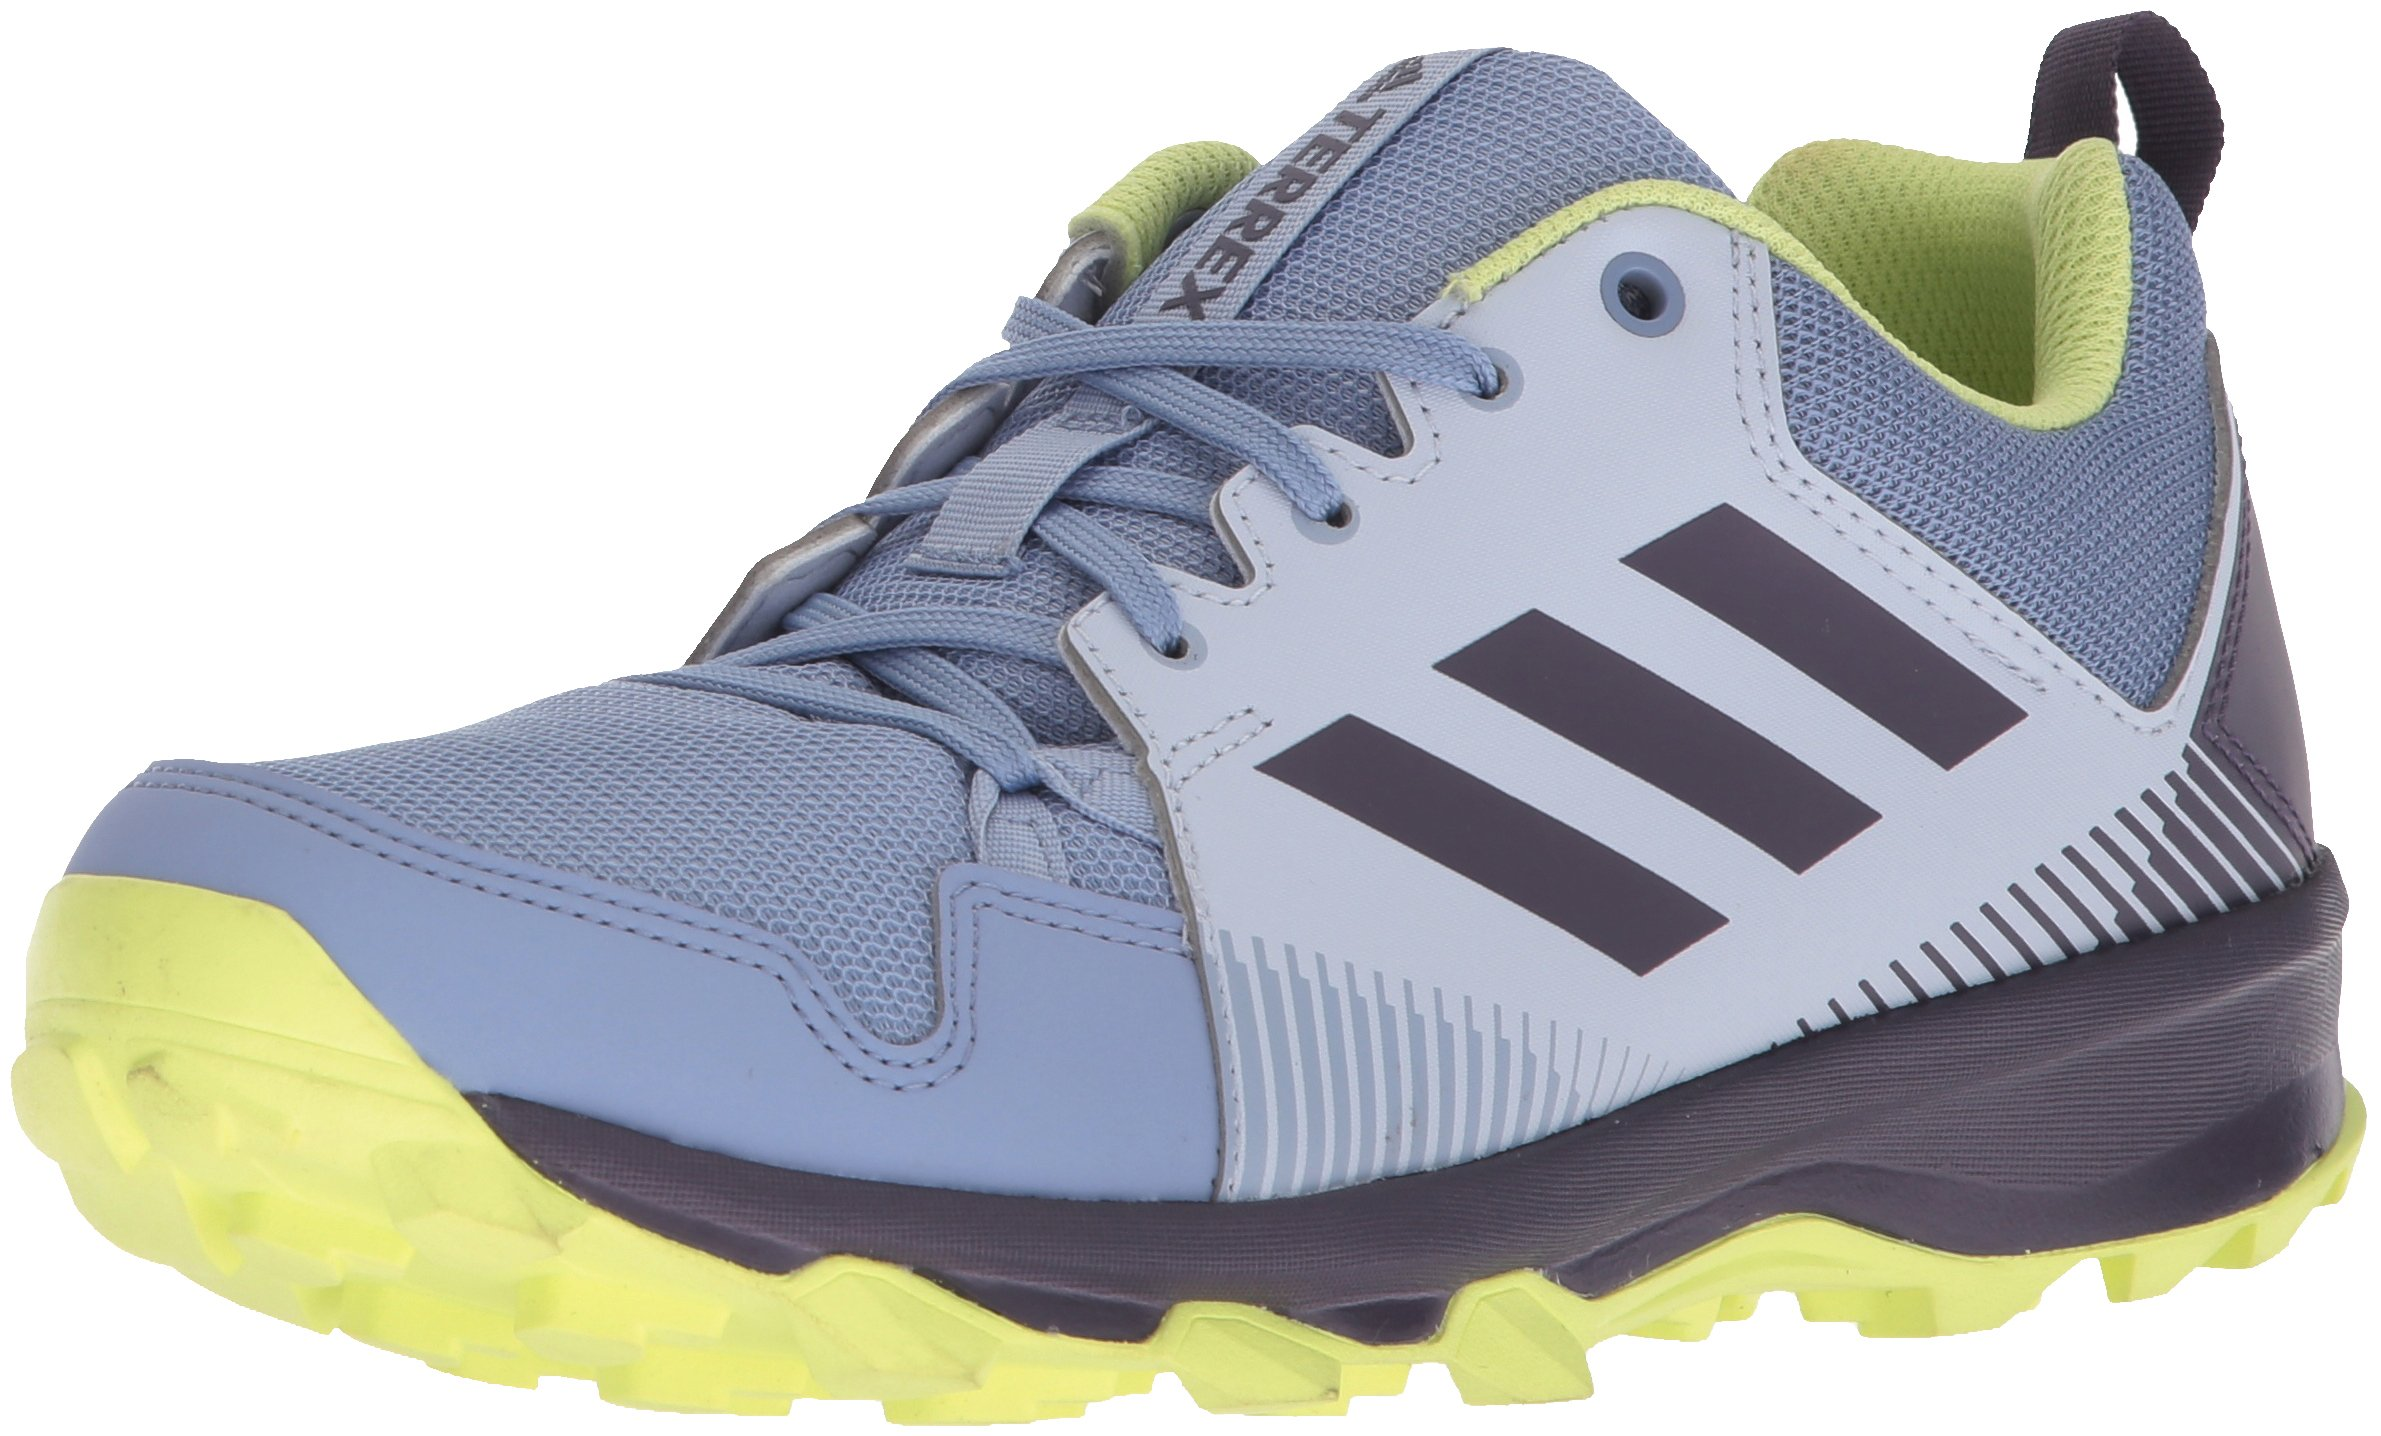 adidas outdoor Women's Terrex Tracerocker W Trail Running Shoe aero Blue/Trace Purple/semi Frozen Yellow 6 M US by adidas outdoor (Image #1)